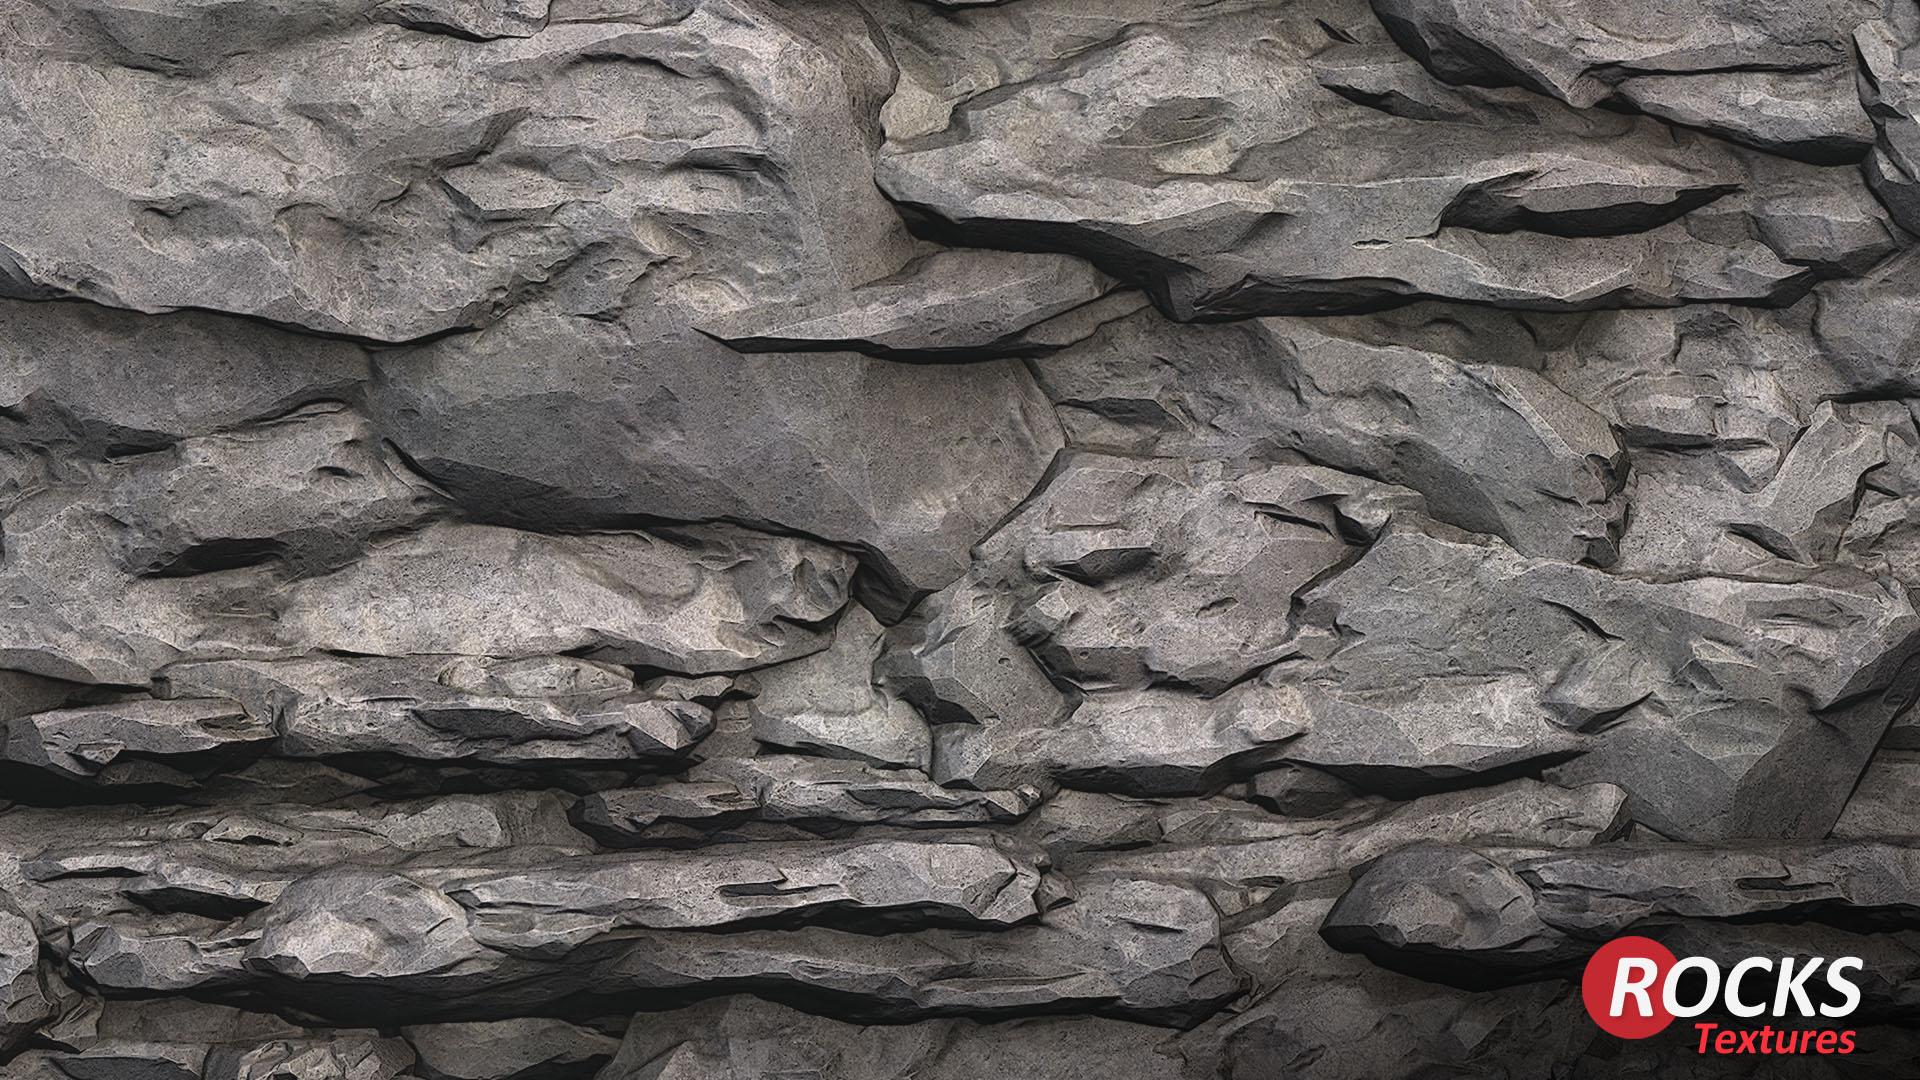 rock_stone_sculpted_textures_05.jpg